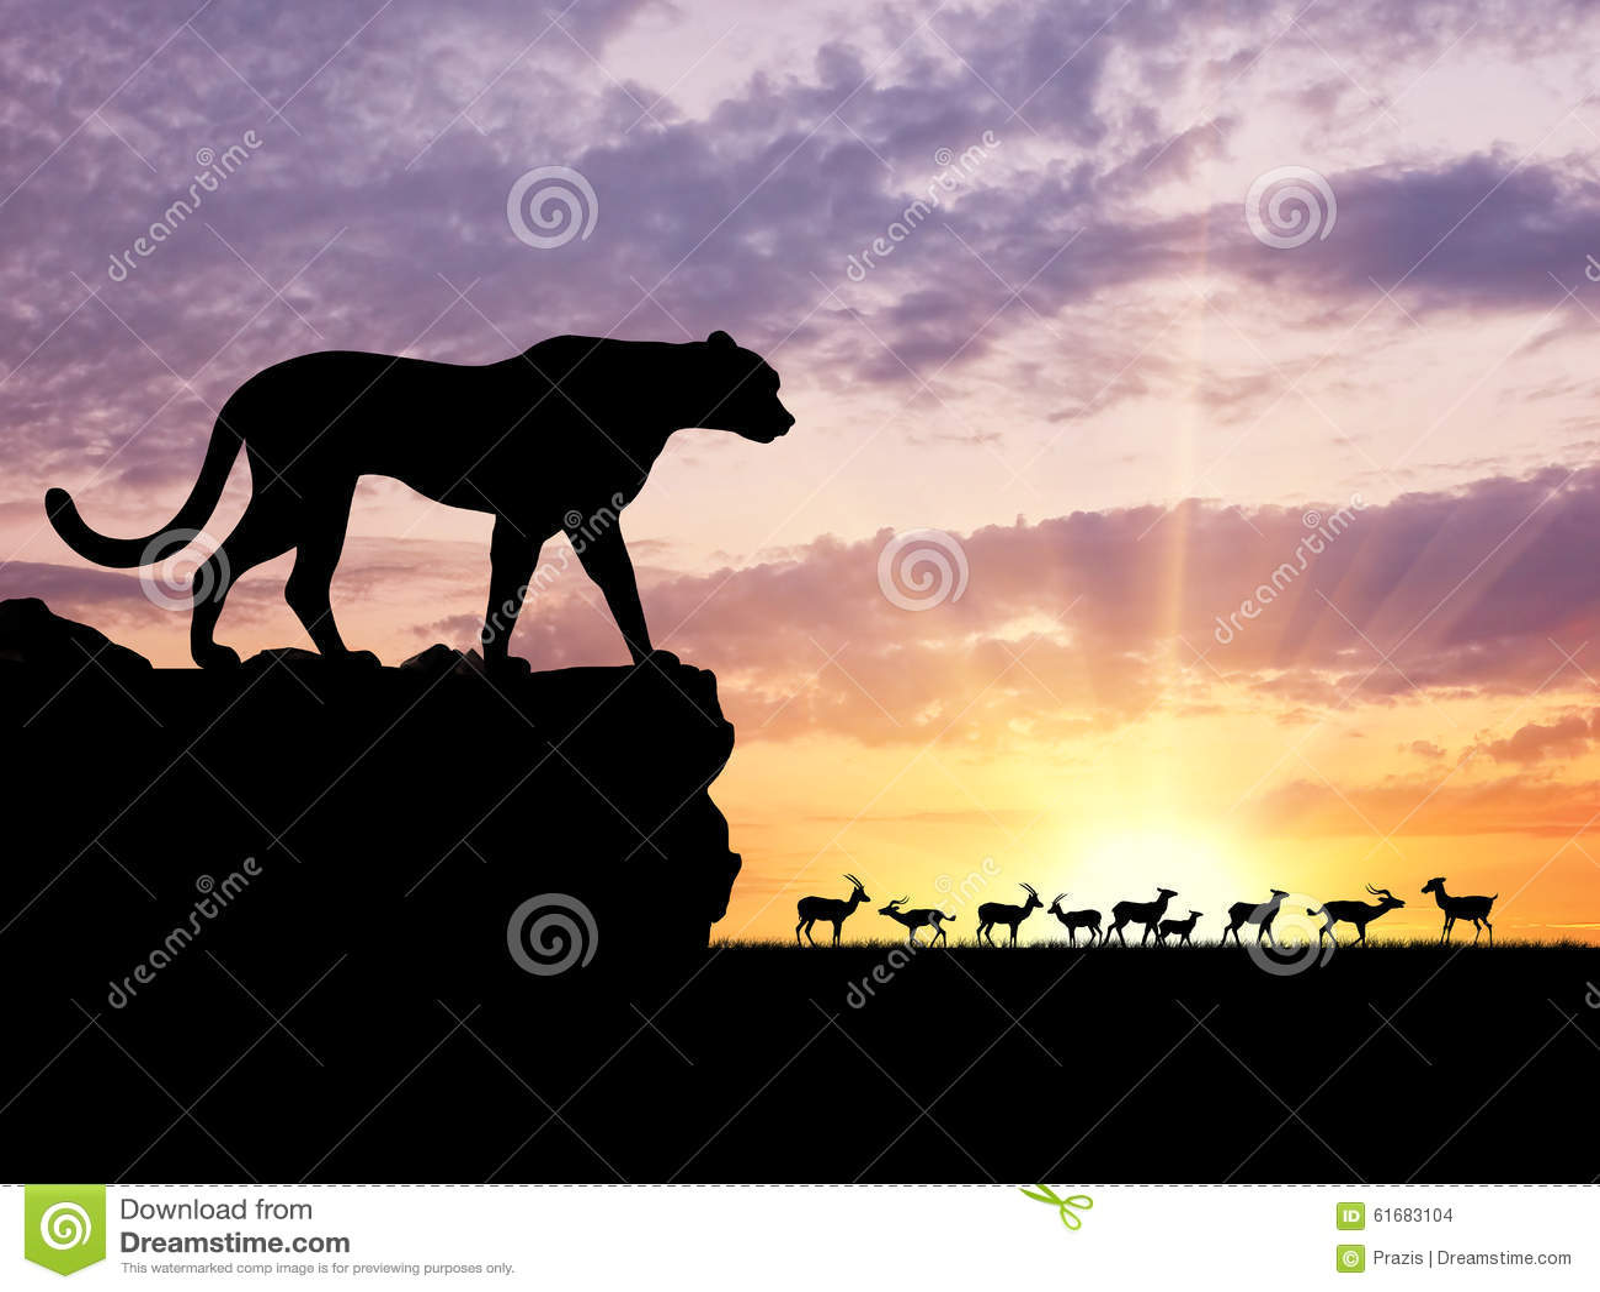 Cheetah hunting a thomson gazelle stock image image of.